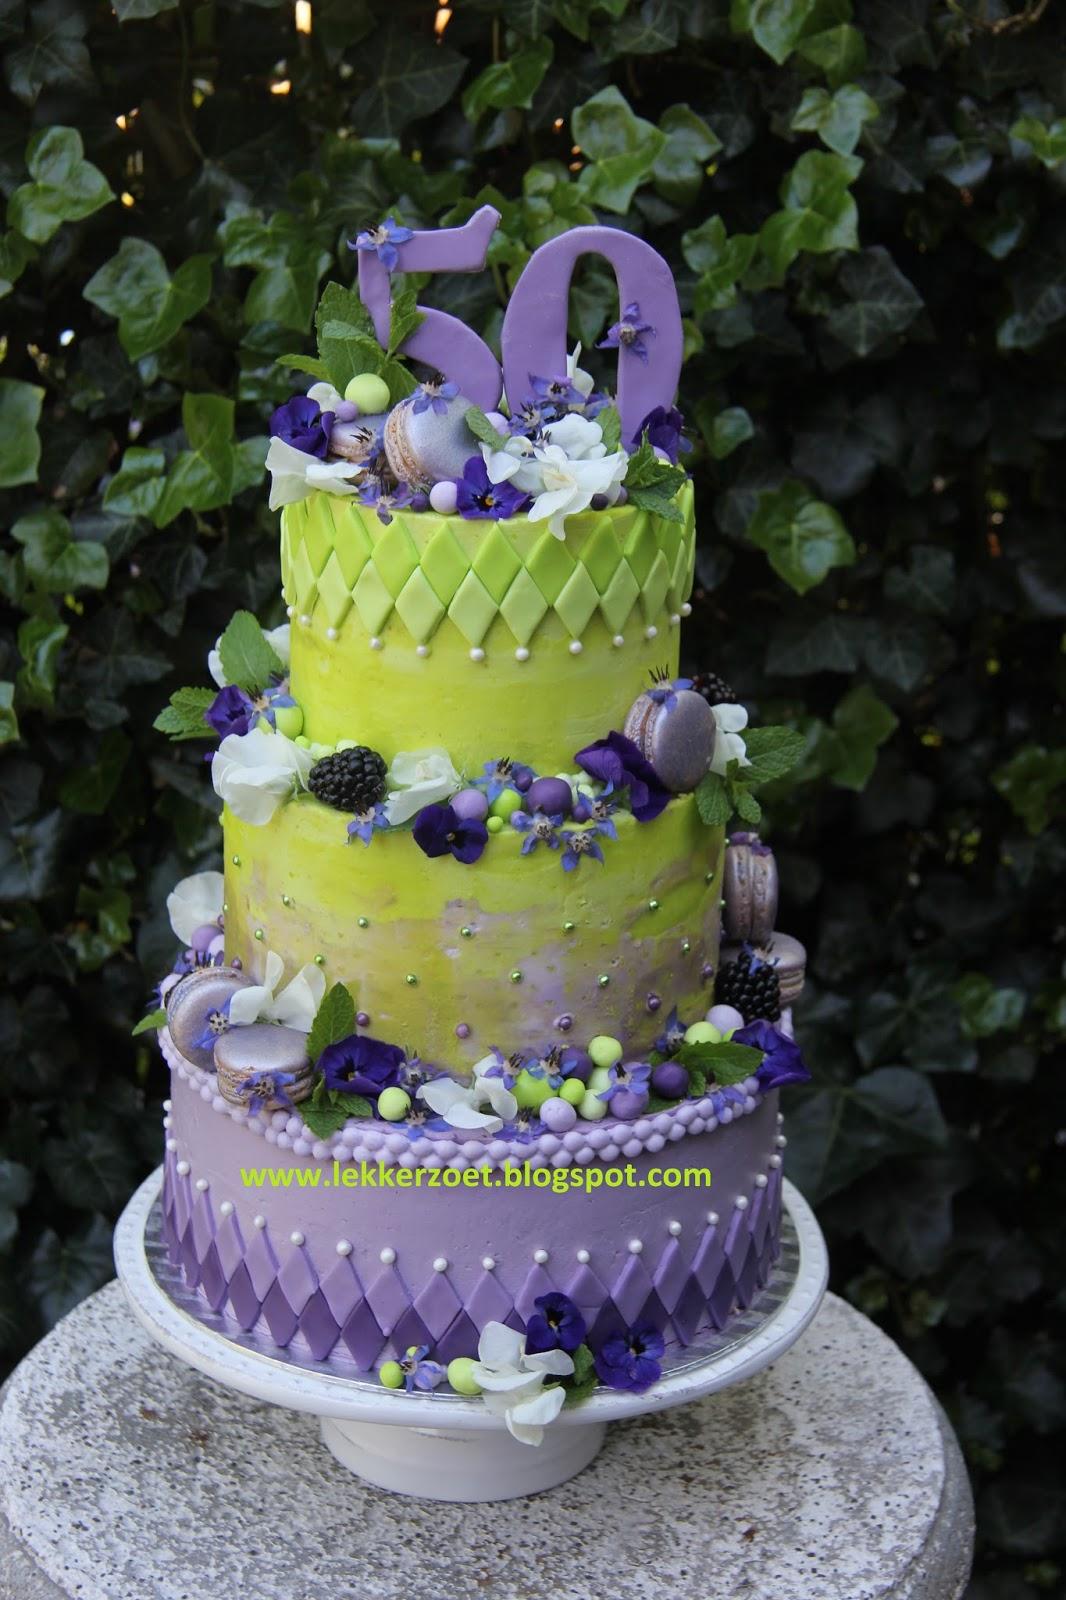 Fabulous lekker zoet: Gerrie 50 jaar bloemen paars en groene taart @IF42